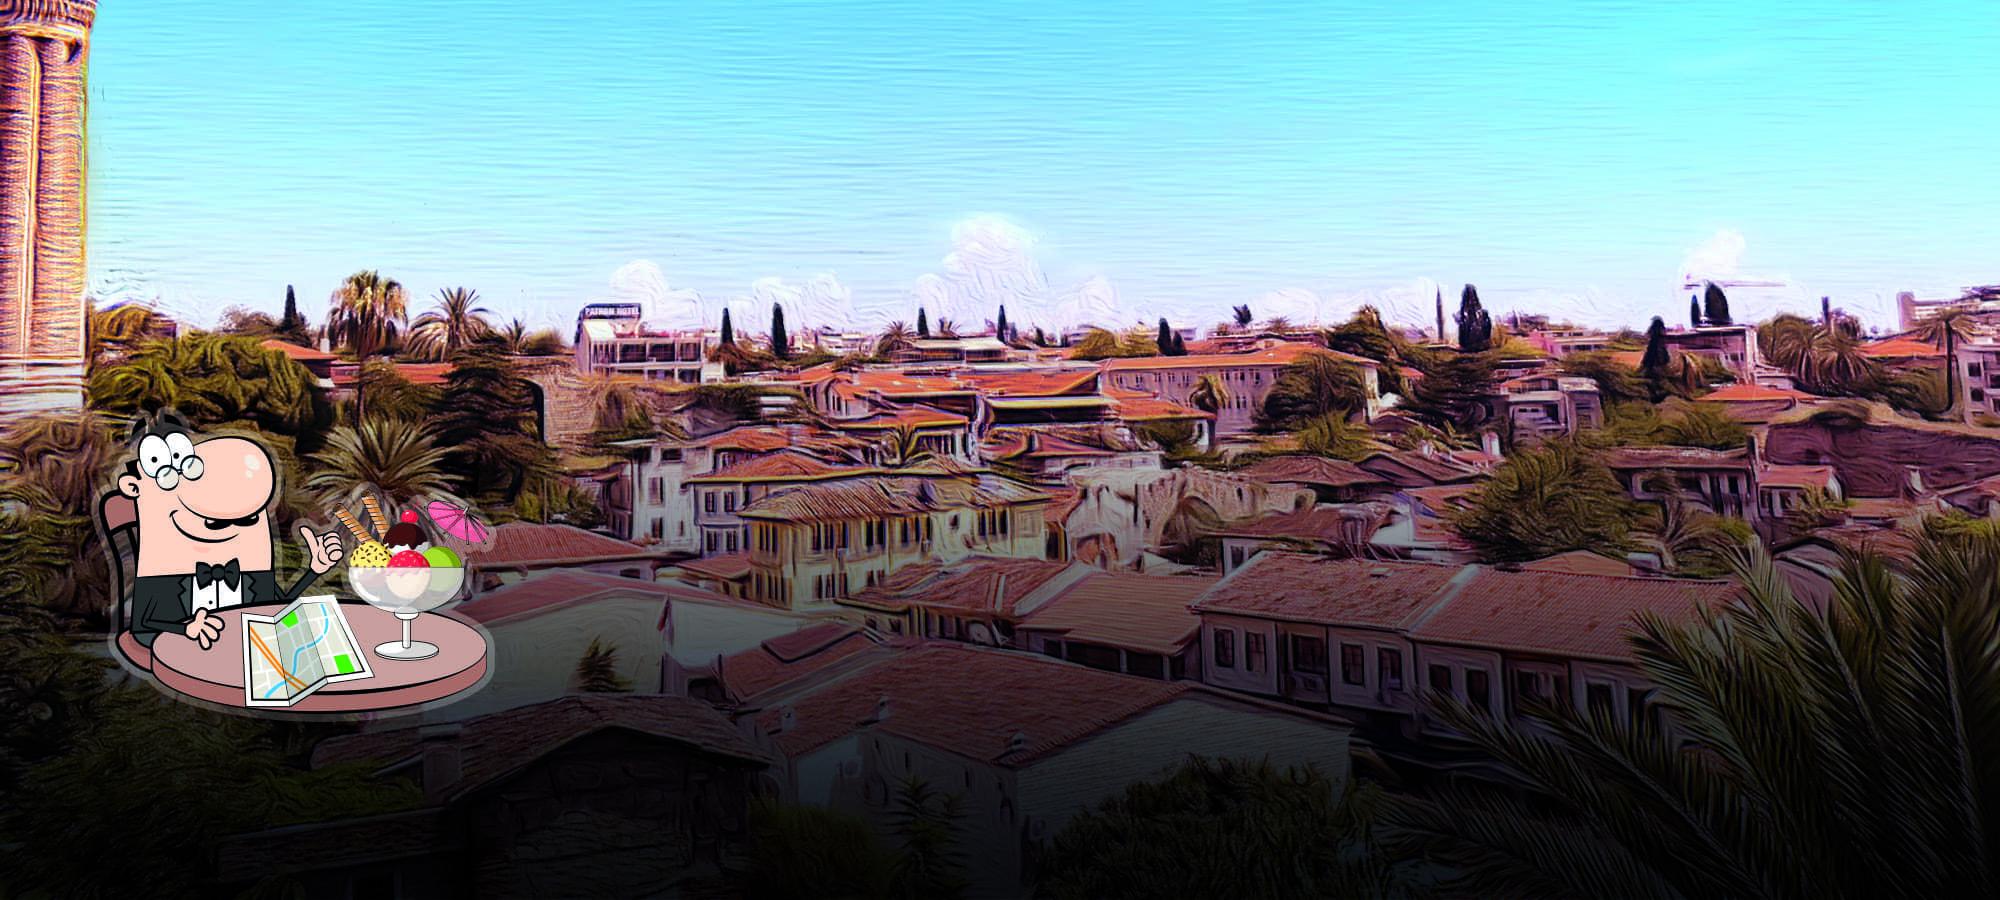 Antalya: the province centre